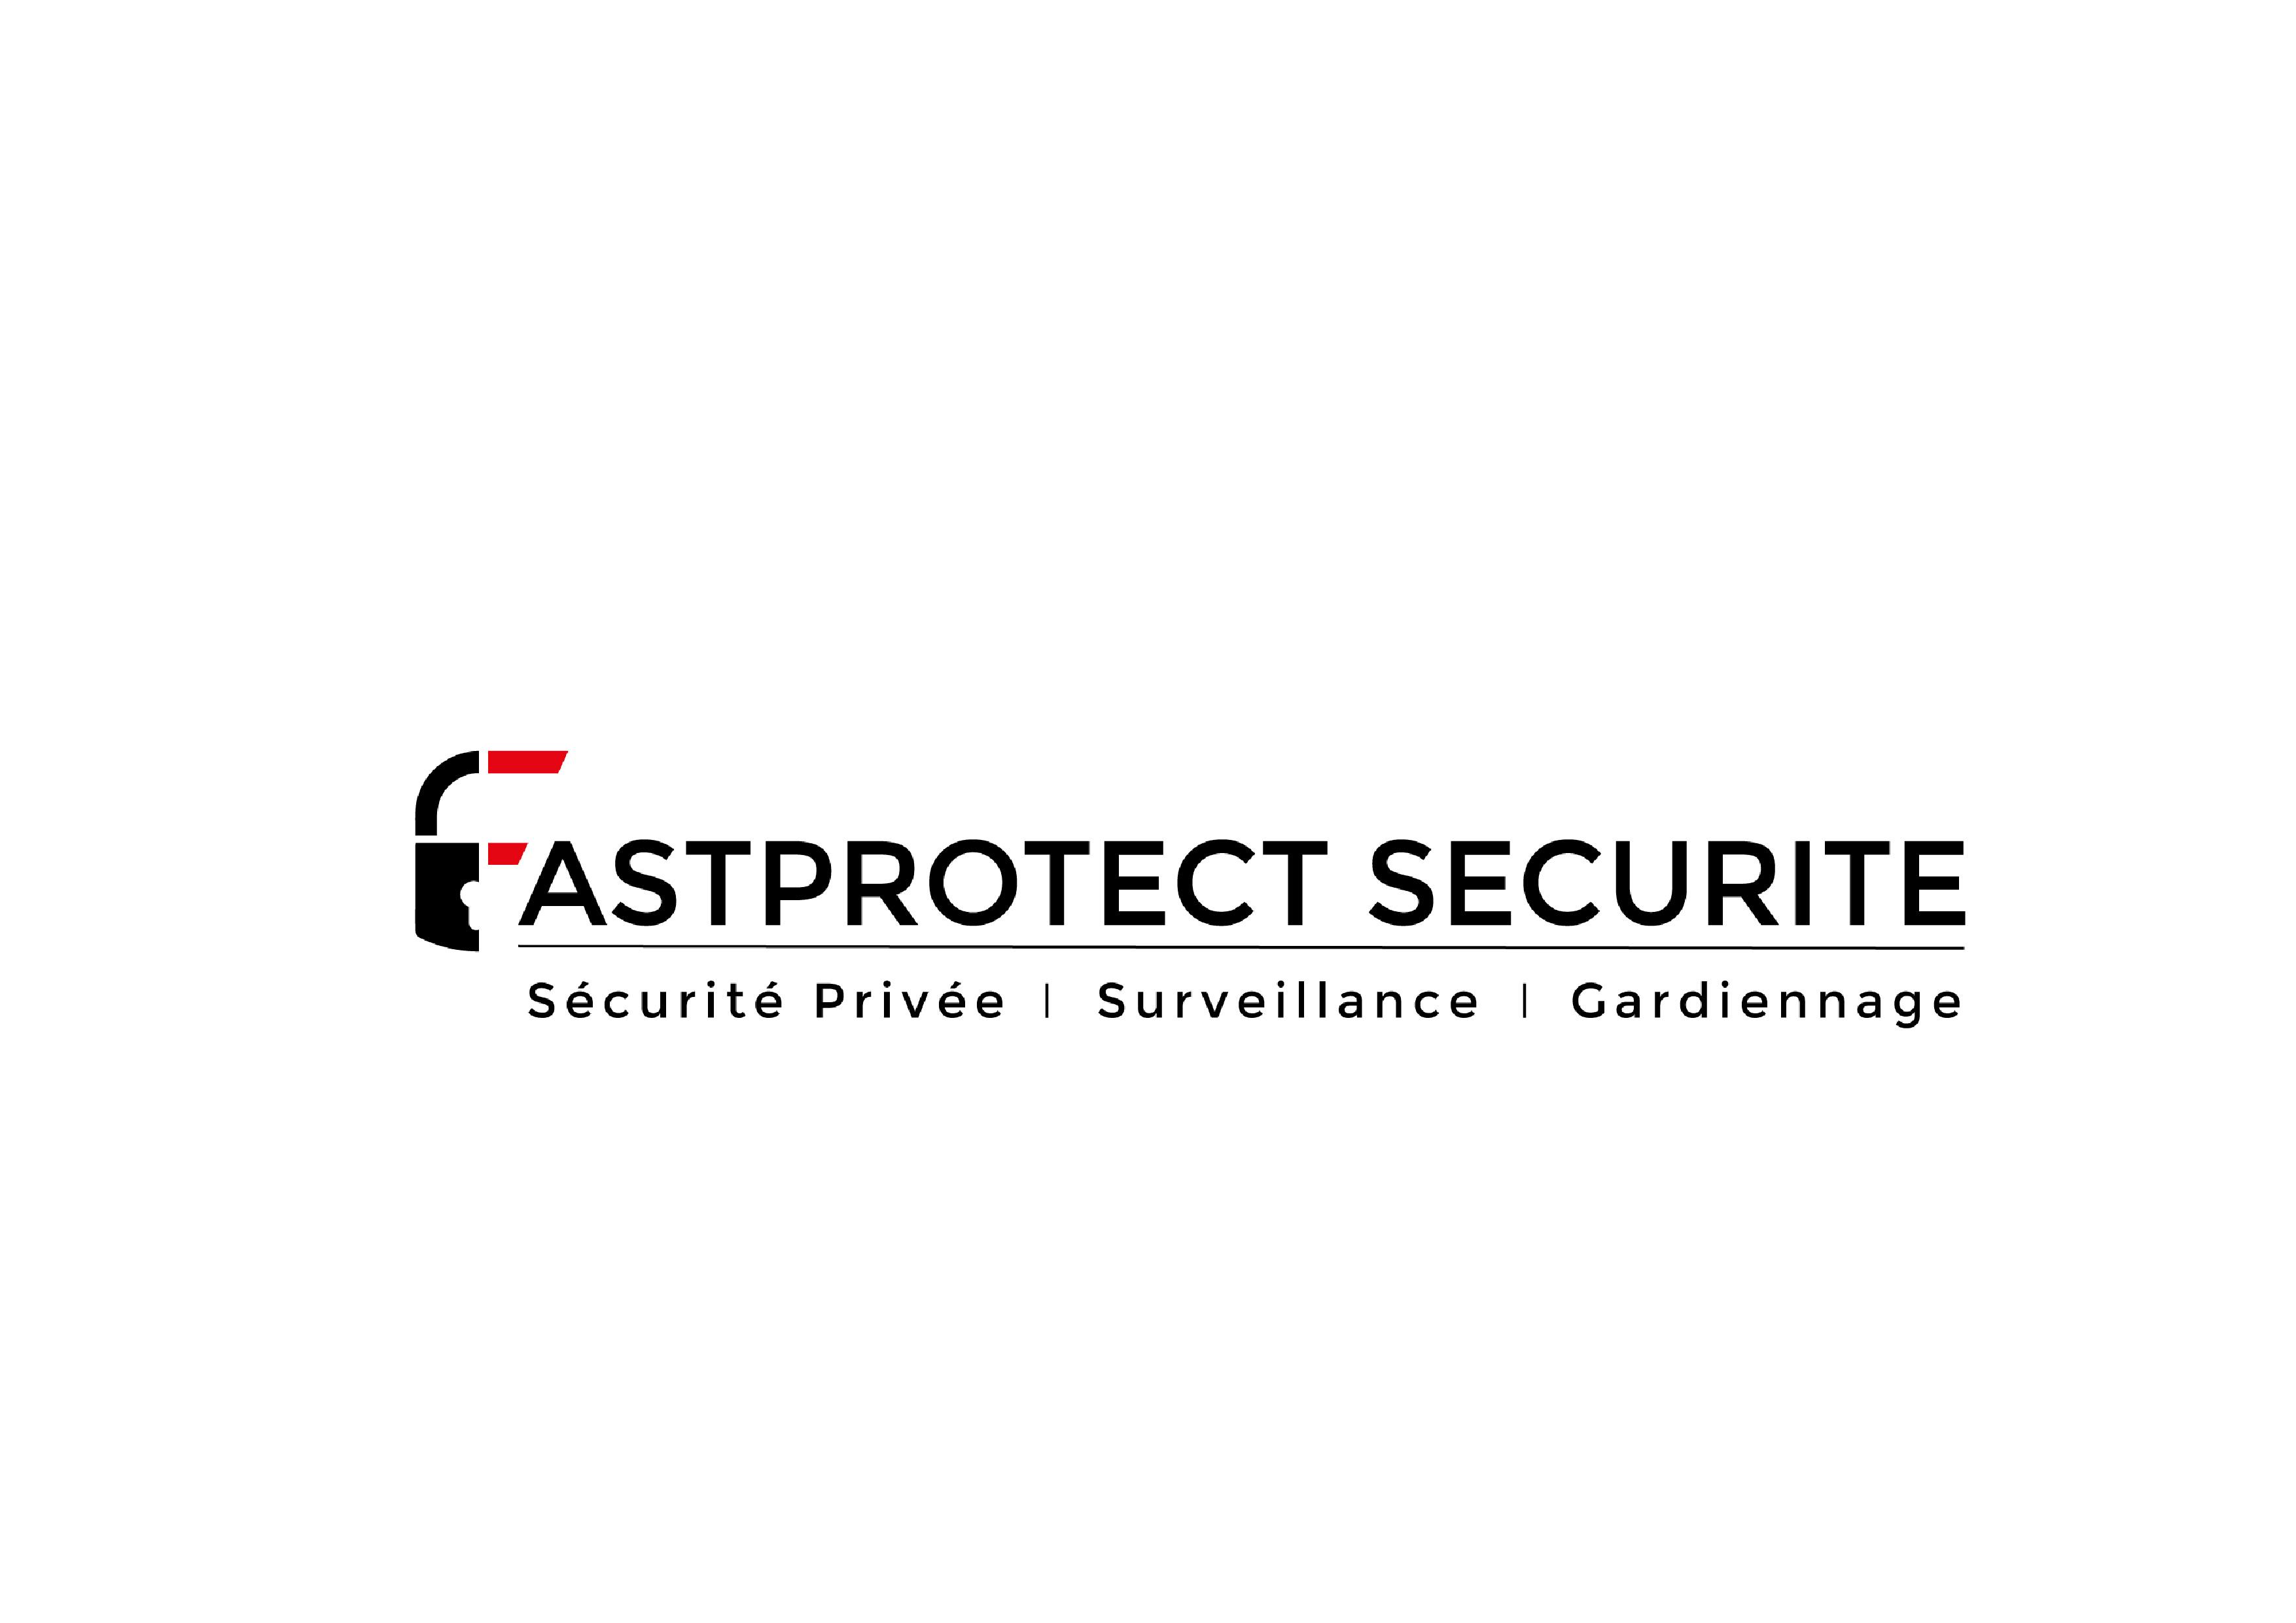 FASTPROTECT SECURITE